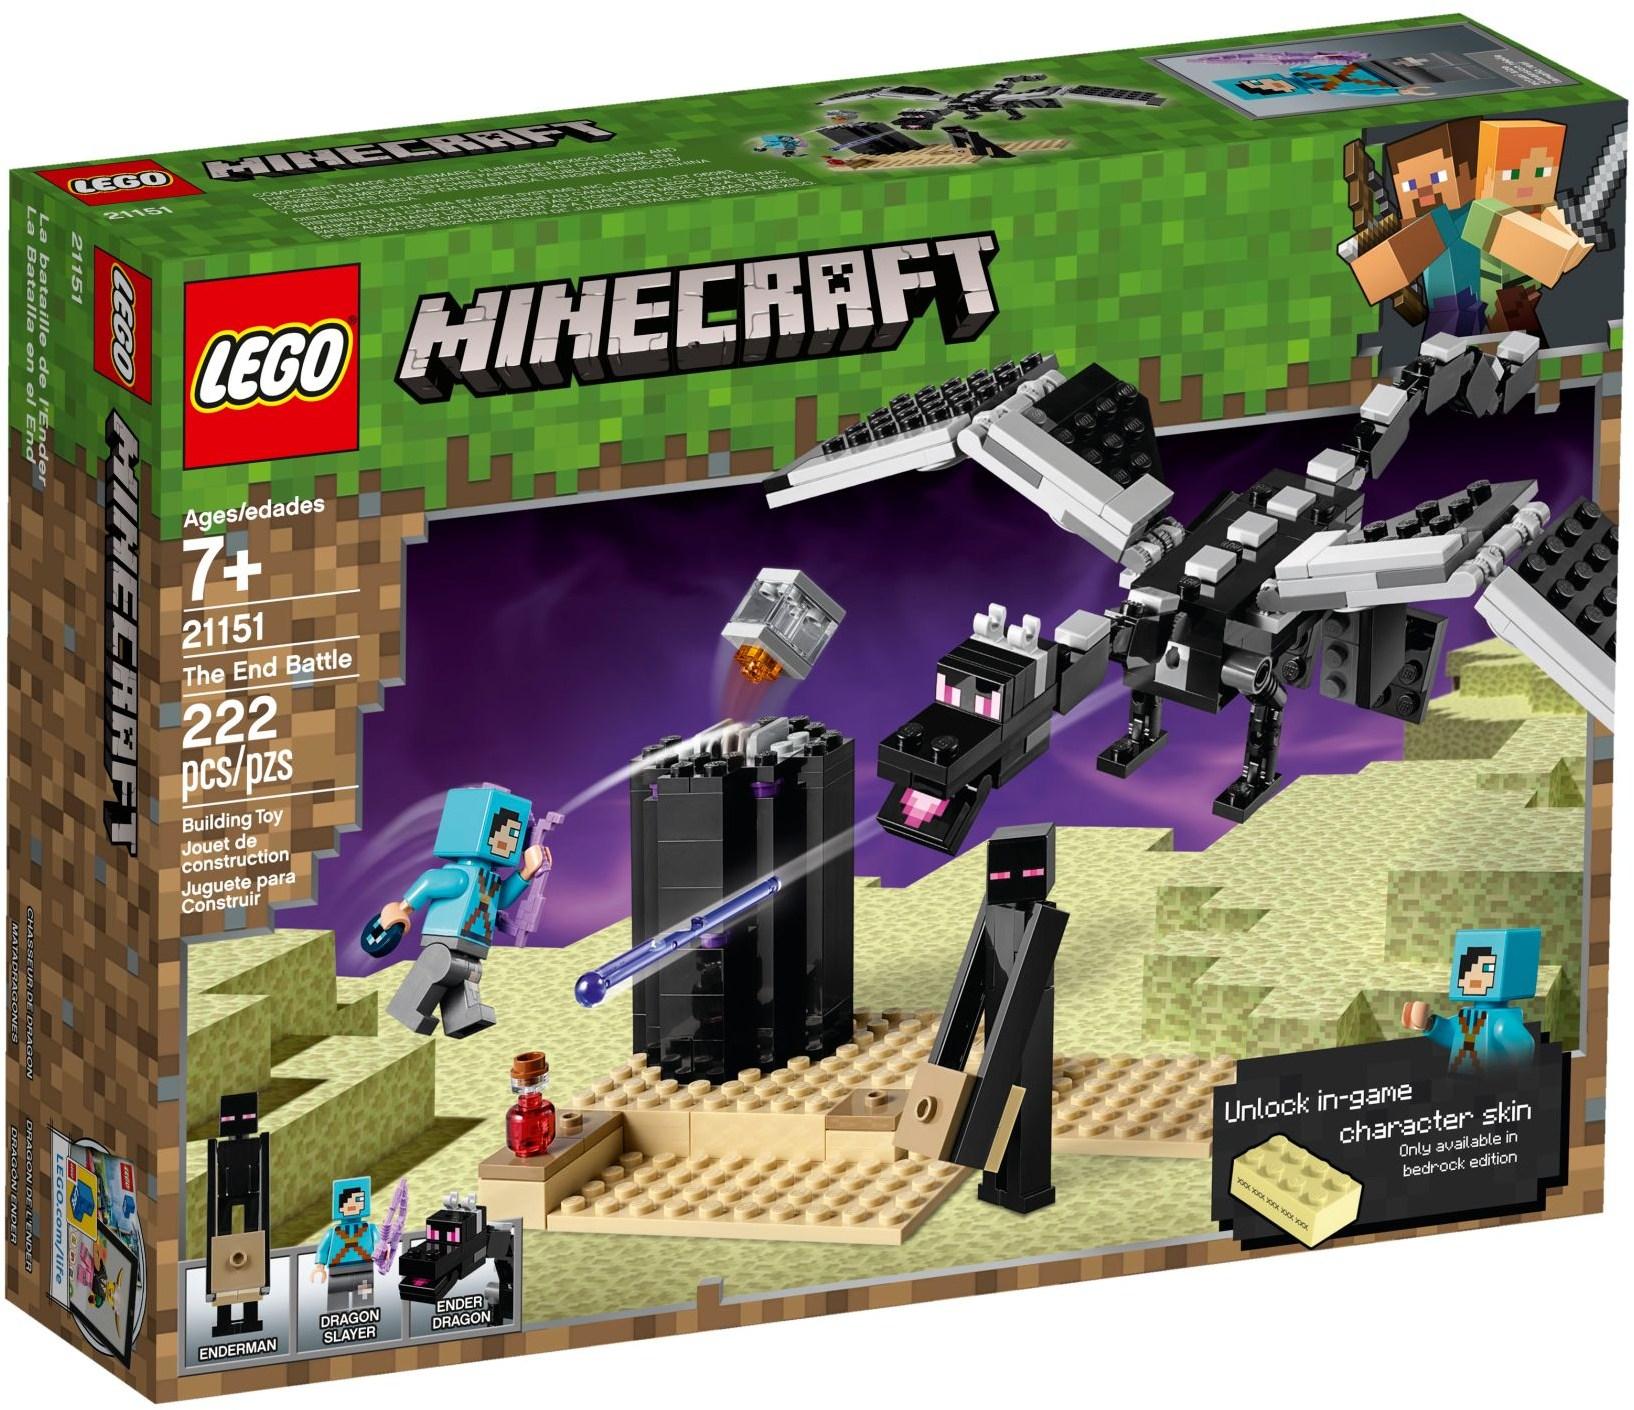 LEGO THE END BATTLE - 21151